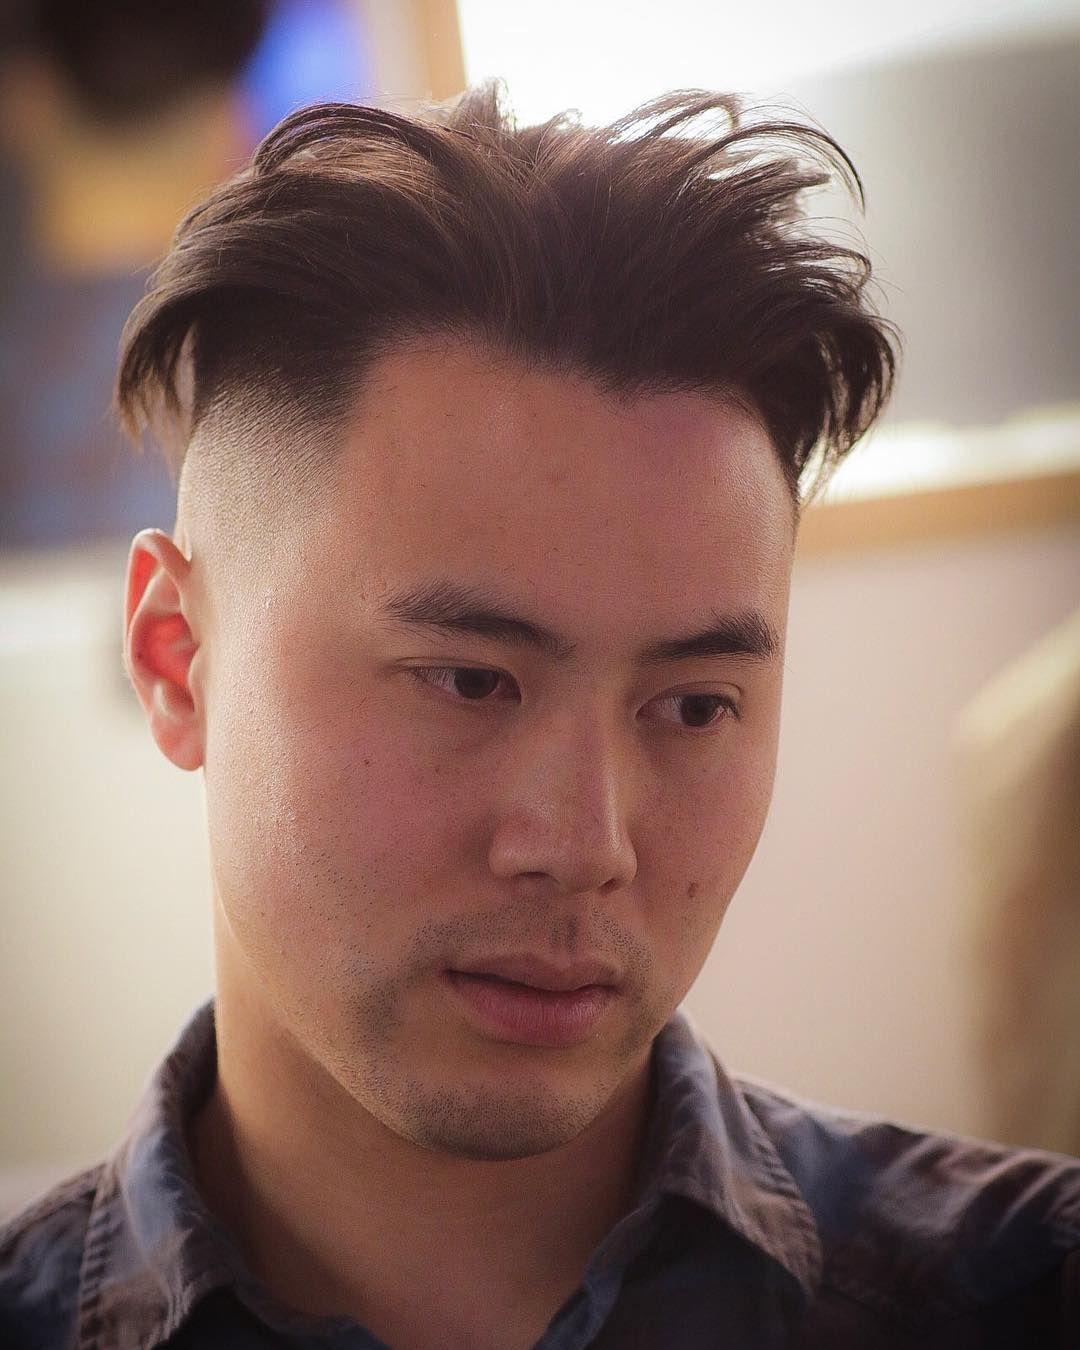 29 Best Hairstyles For Asian Men 2020 Styles Asian Men Hairstyle Asian Man Haircut Cool Hairstyles